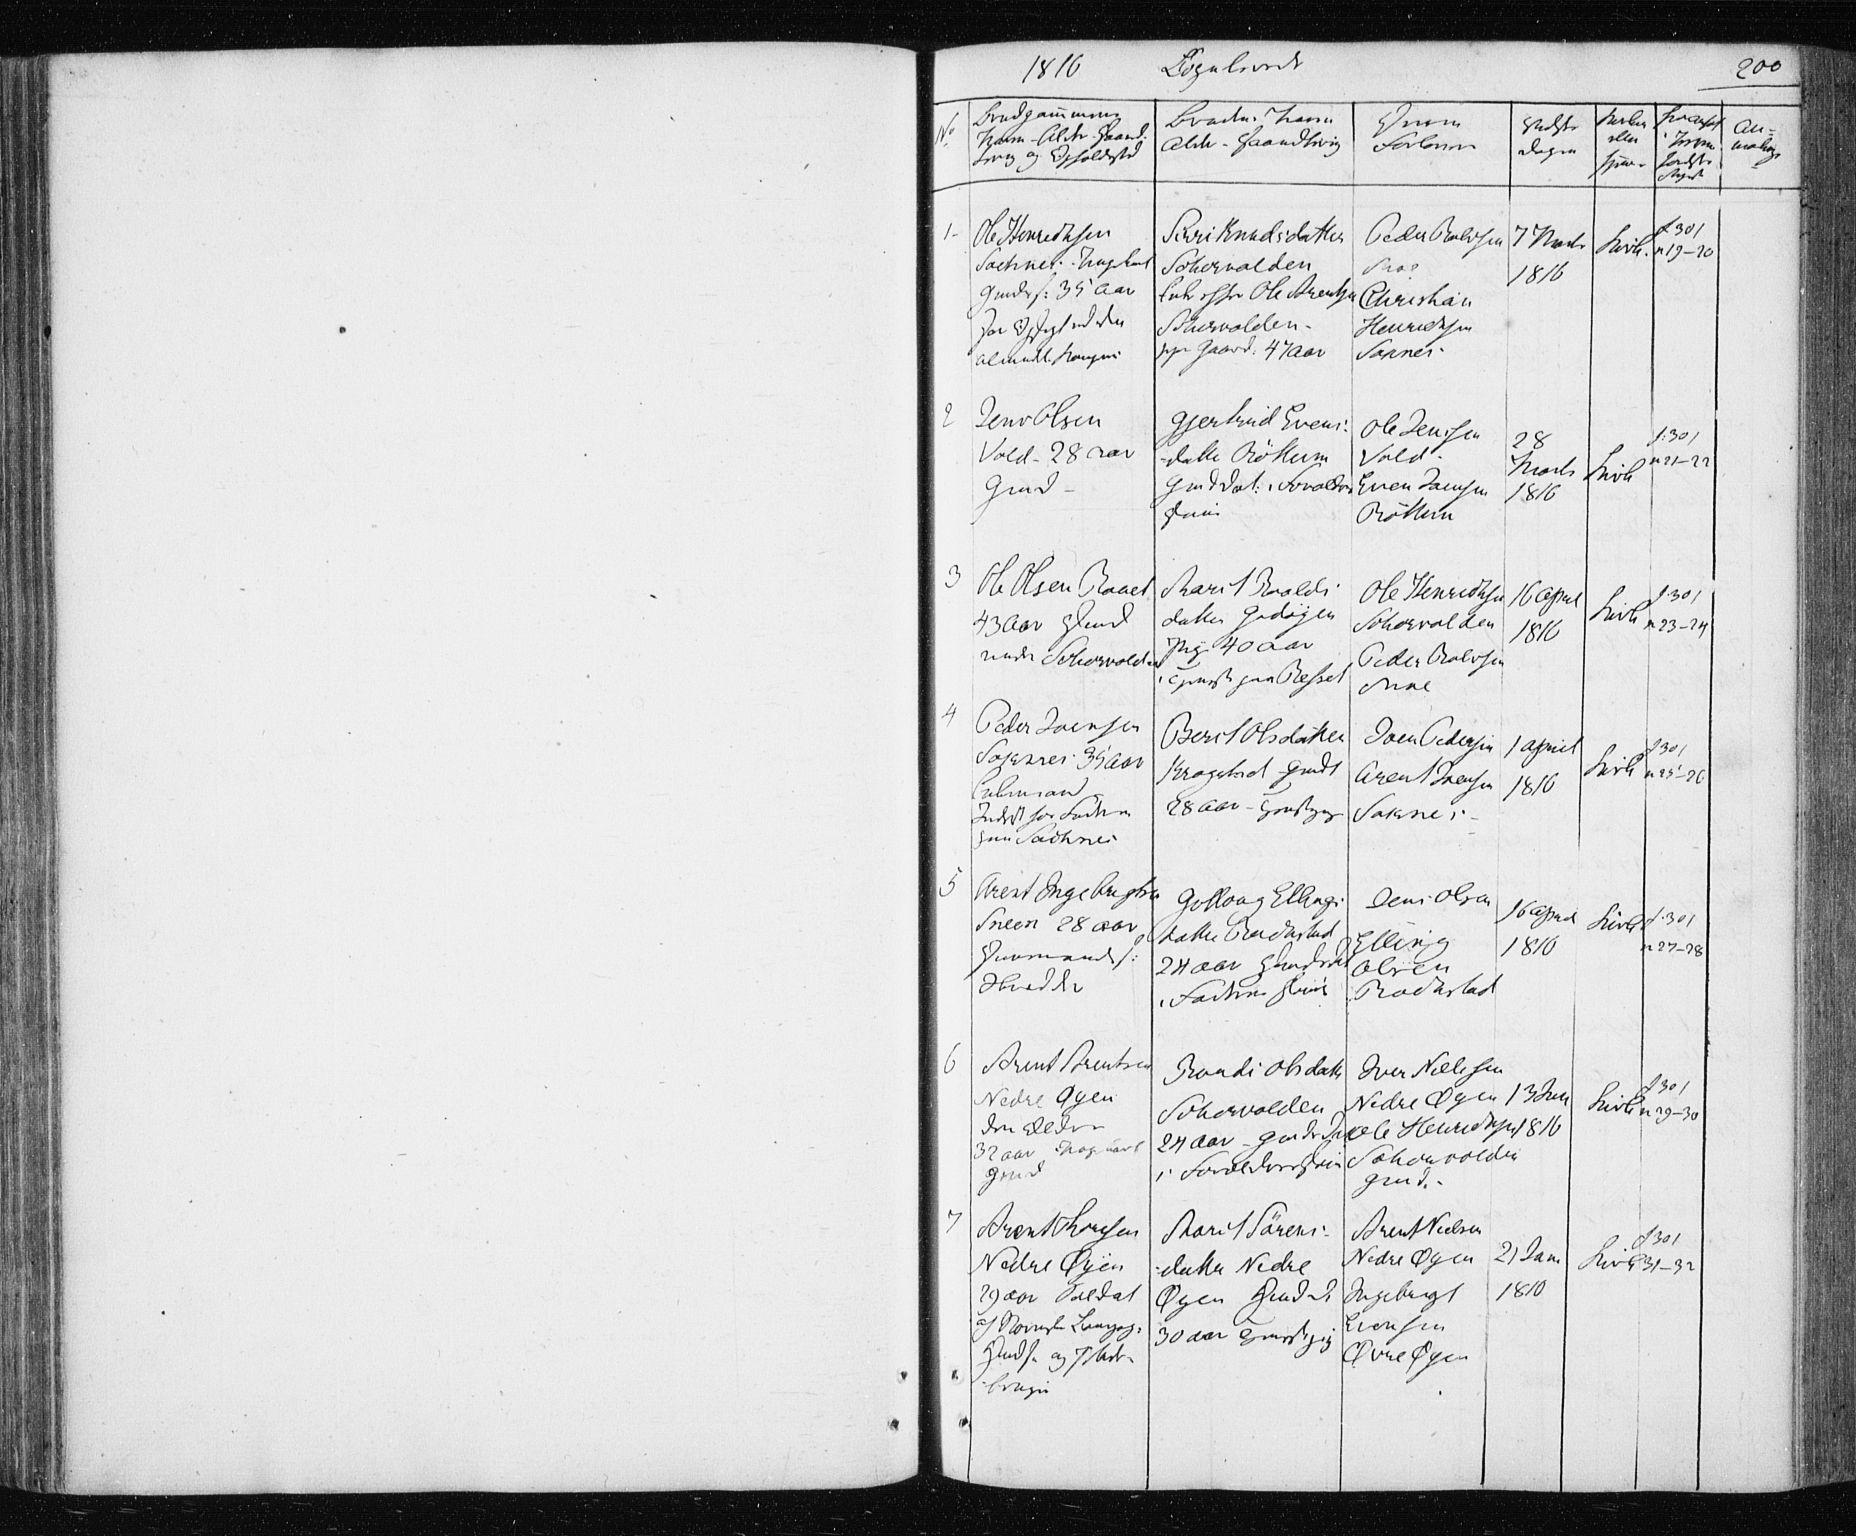 SAT, Ministerialprotokoller, klokkerbøker og fødselsregistre - Sør-Trøndelag, 687/L1017: Parish register (copy) no. 687C01, 1816-1837, p. 200